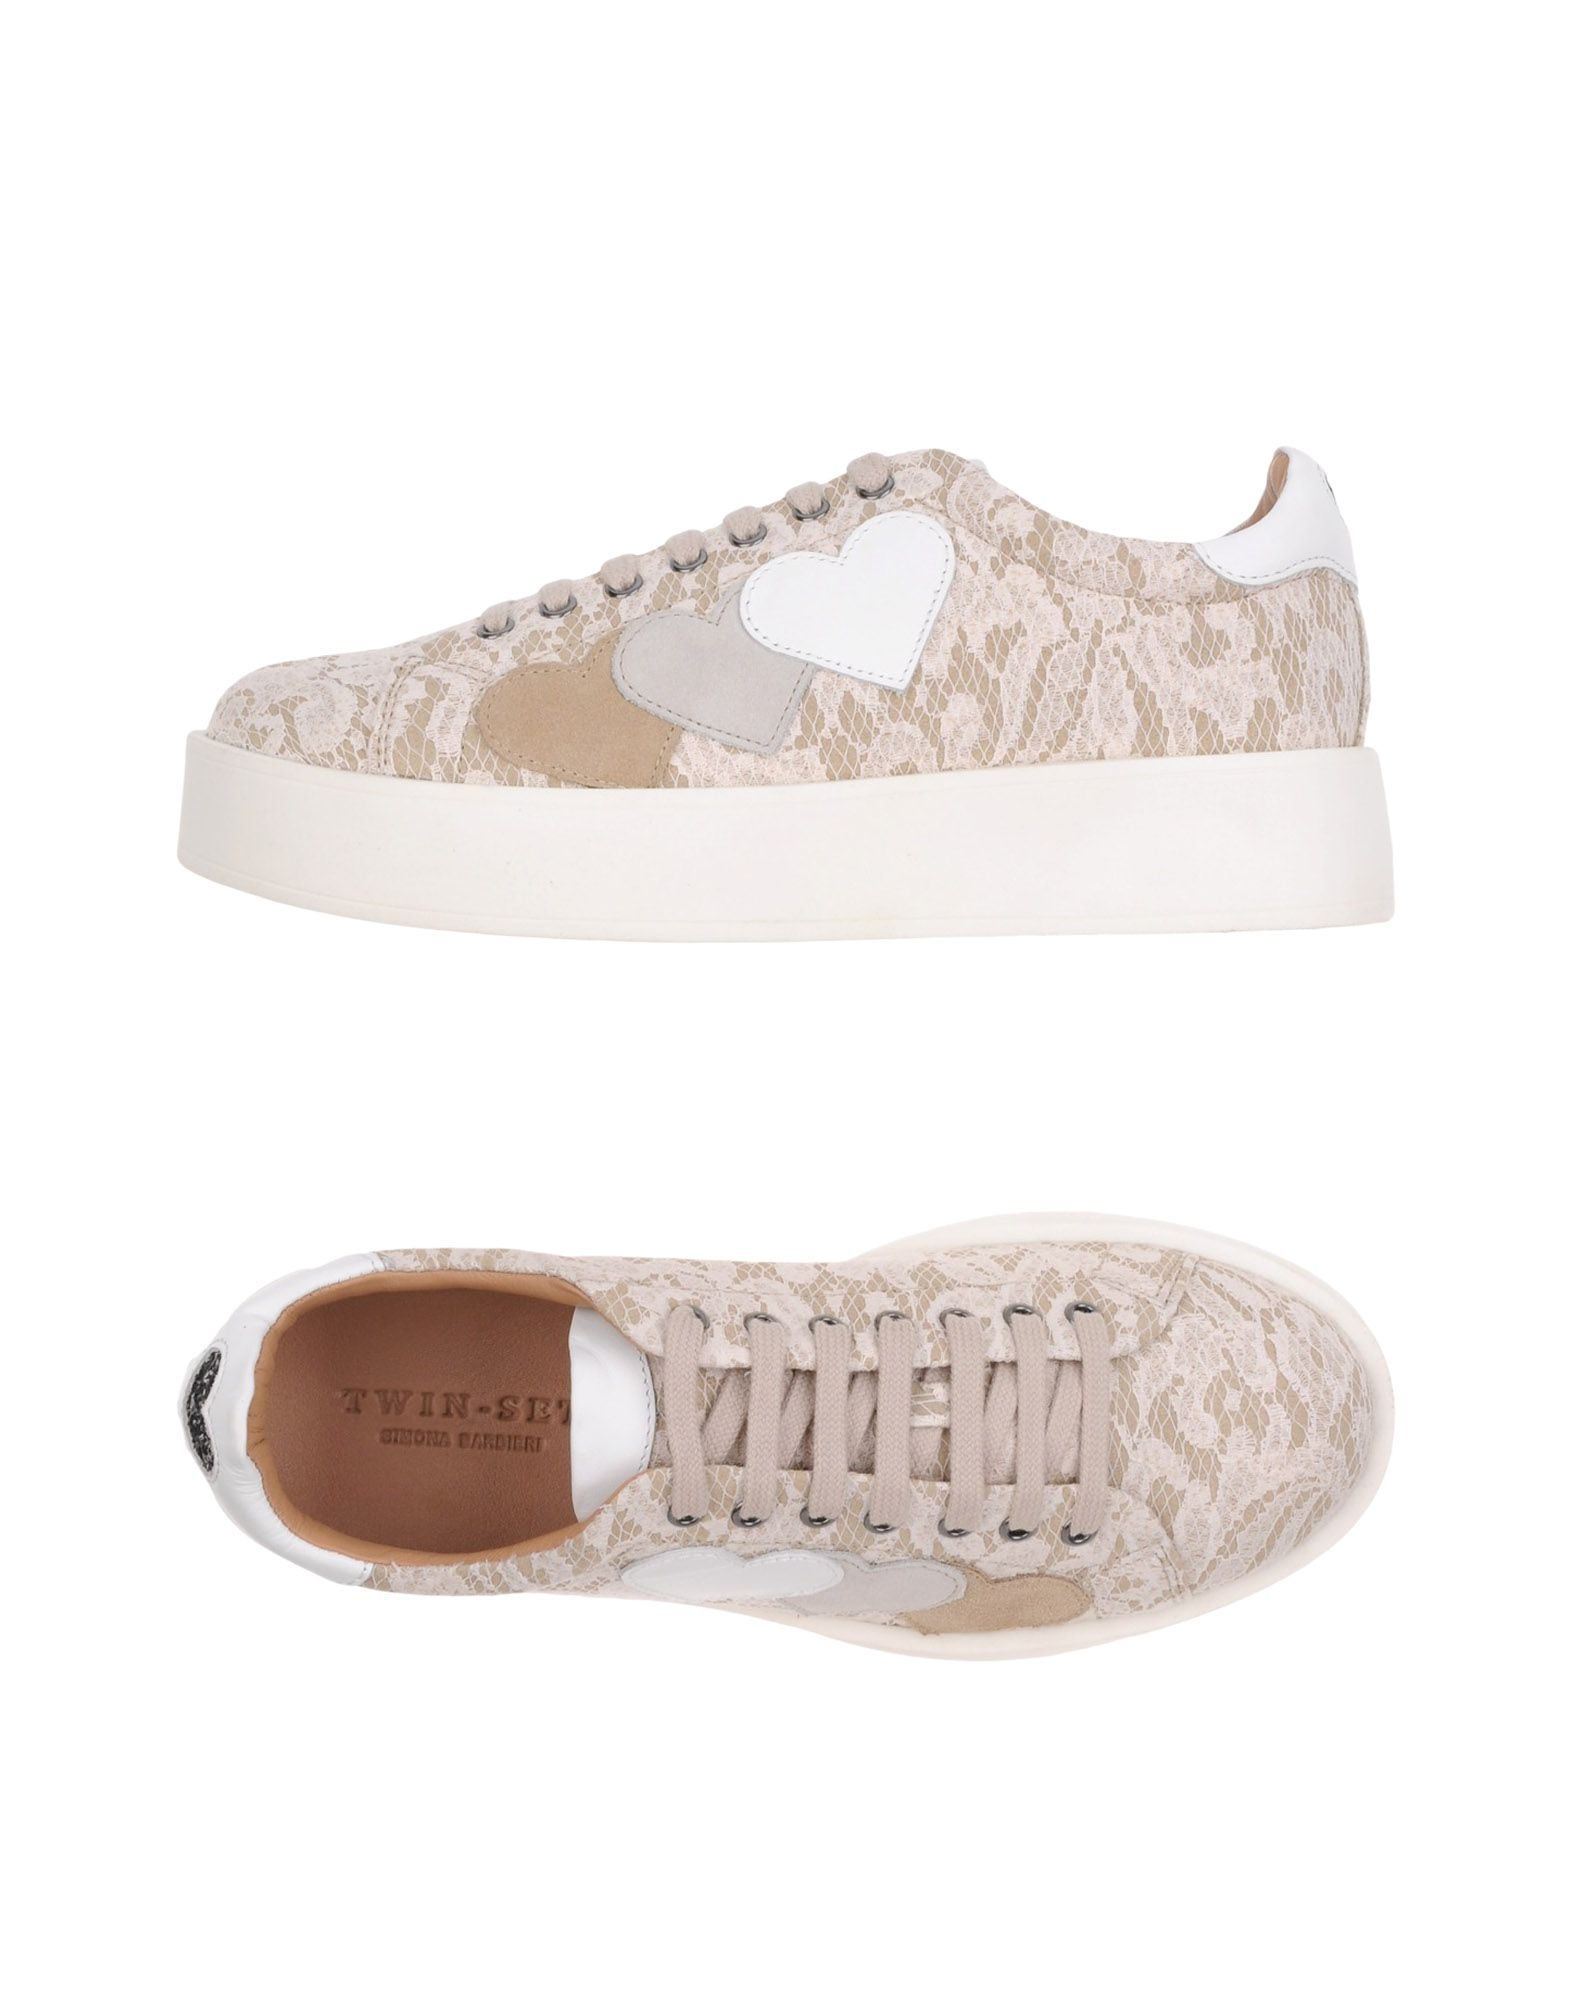 super popular c549b 224d6 TWINSET Sneakers - Footwear | YOOX.COM